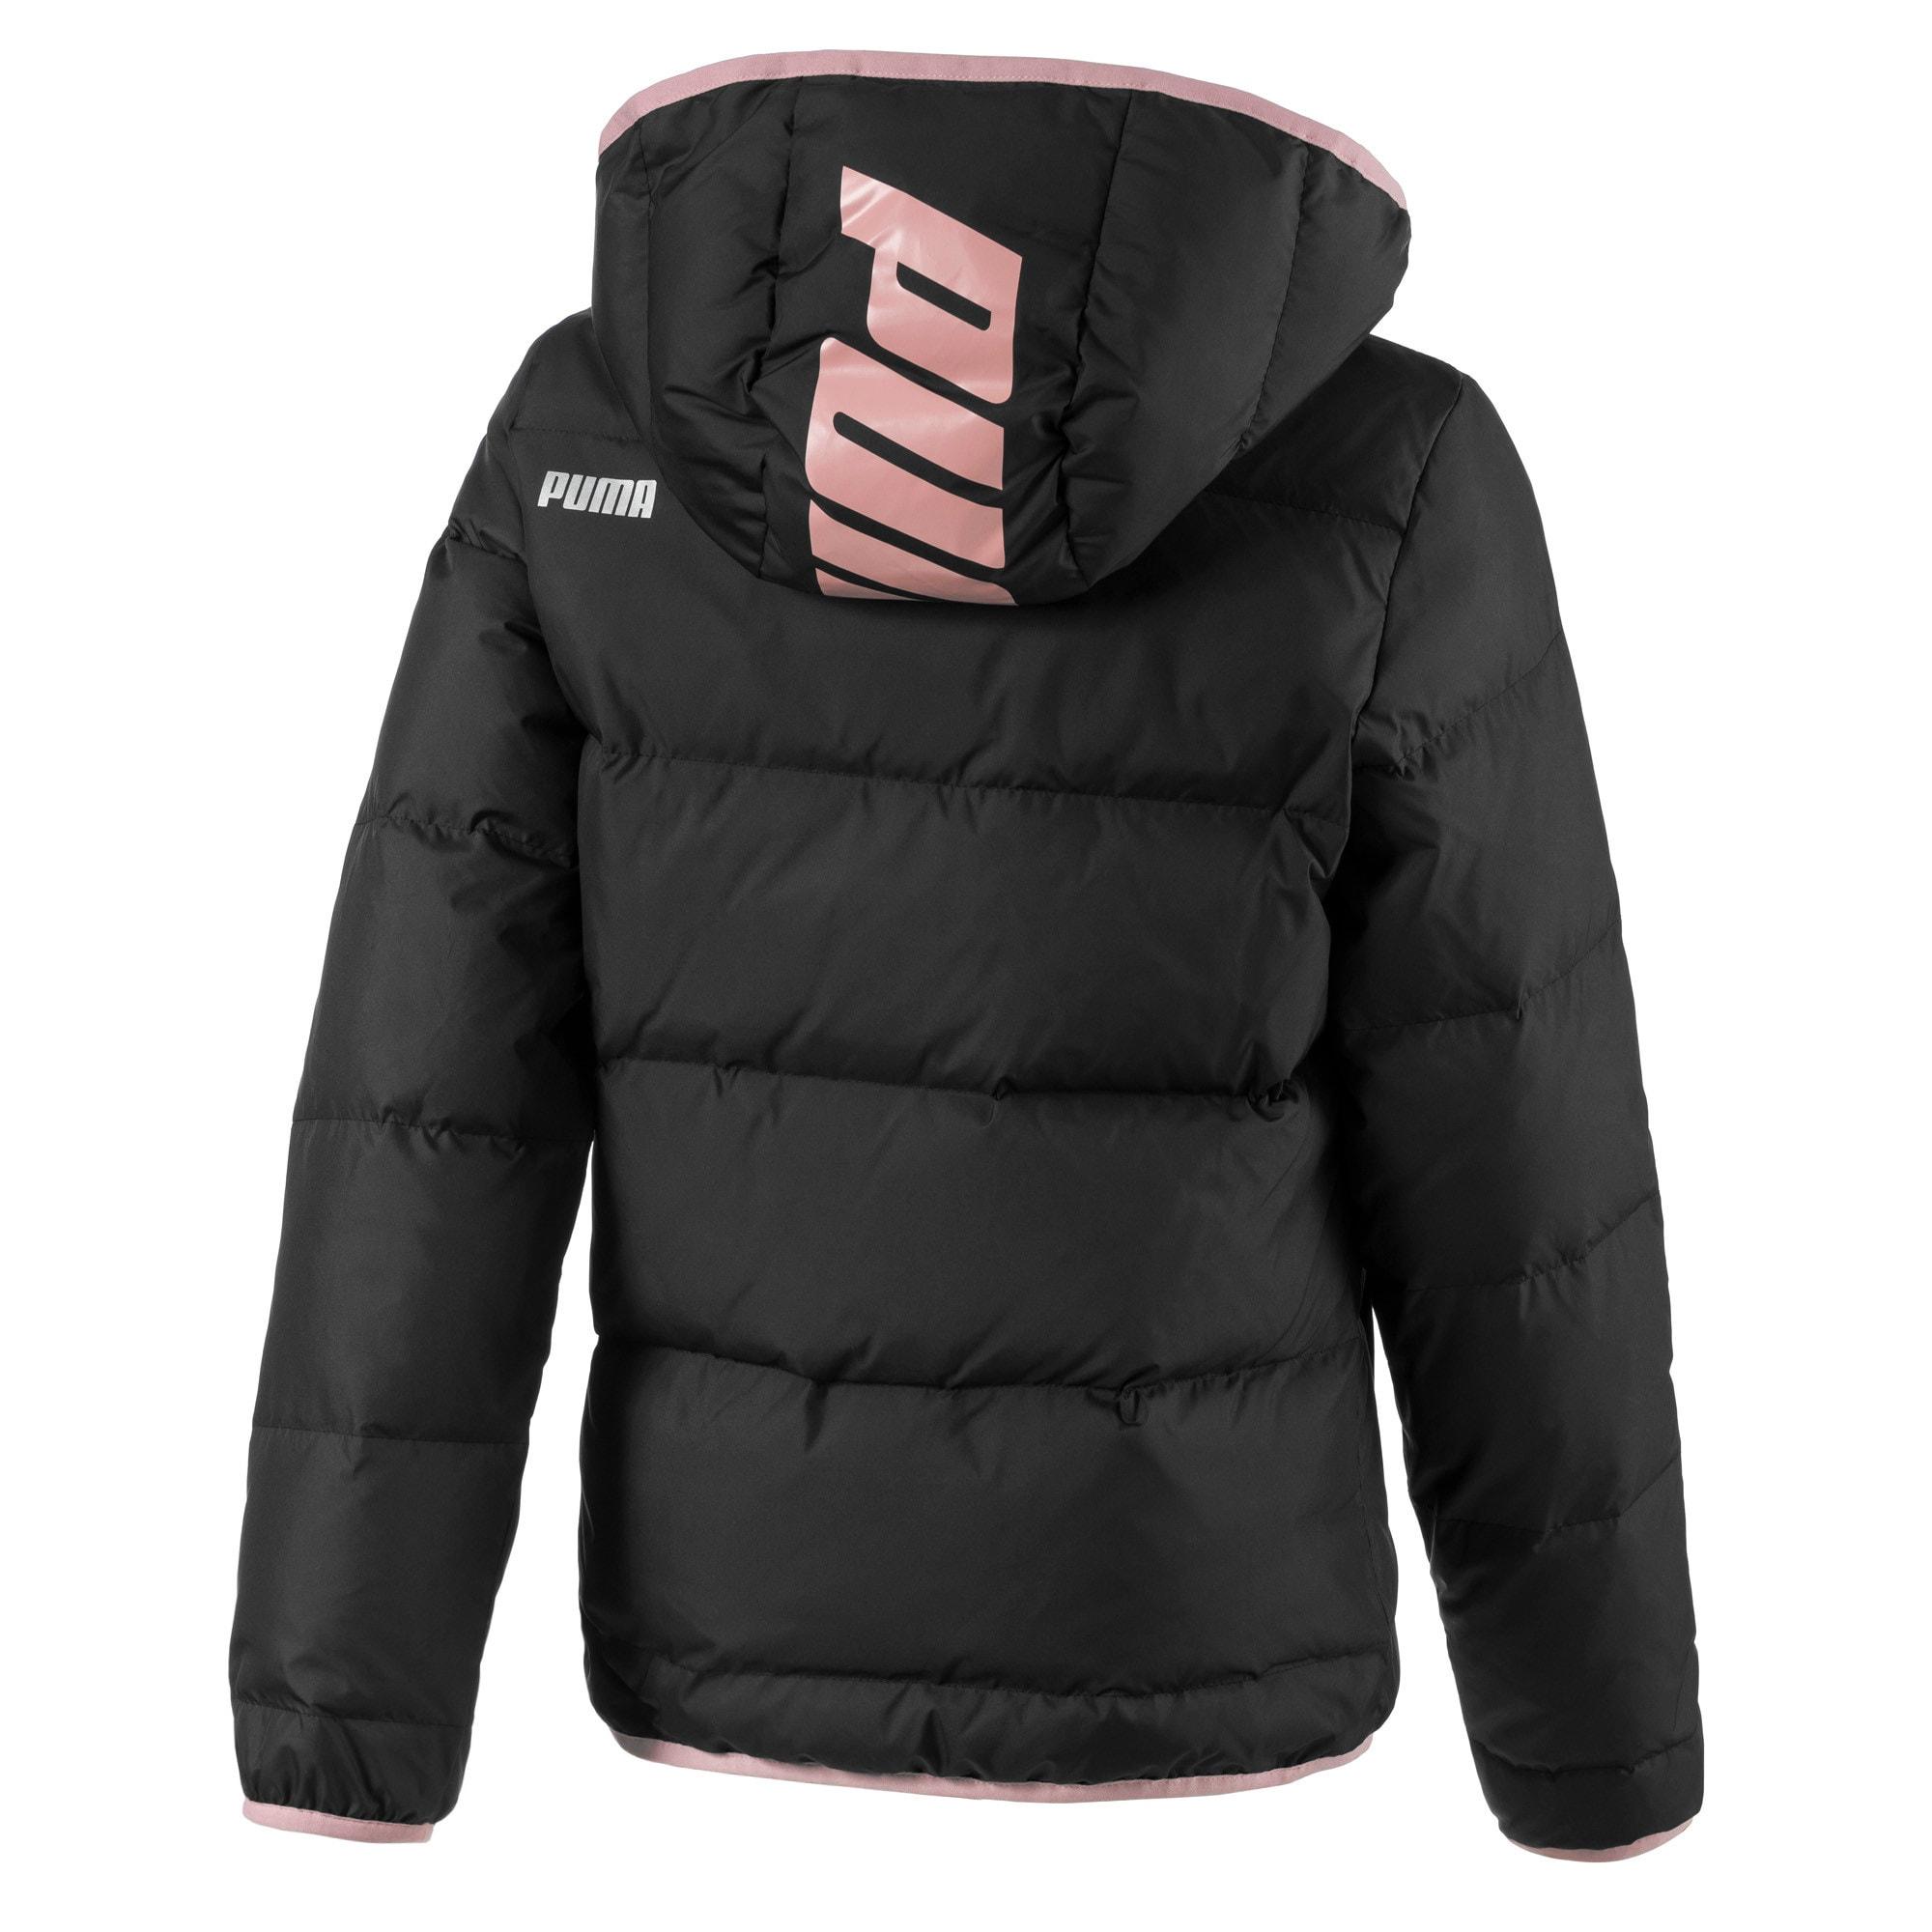 Thumbnail 2 of Light Down Girls' Jacket, Puma Black, medium